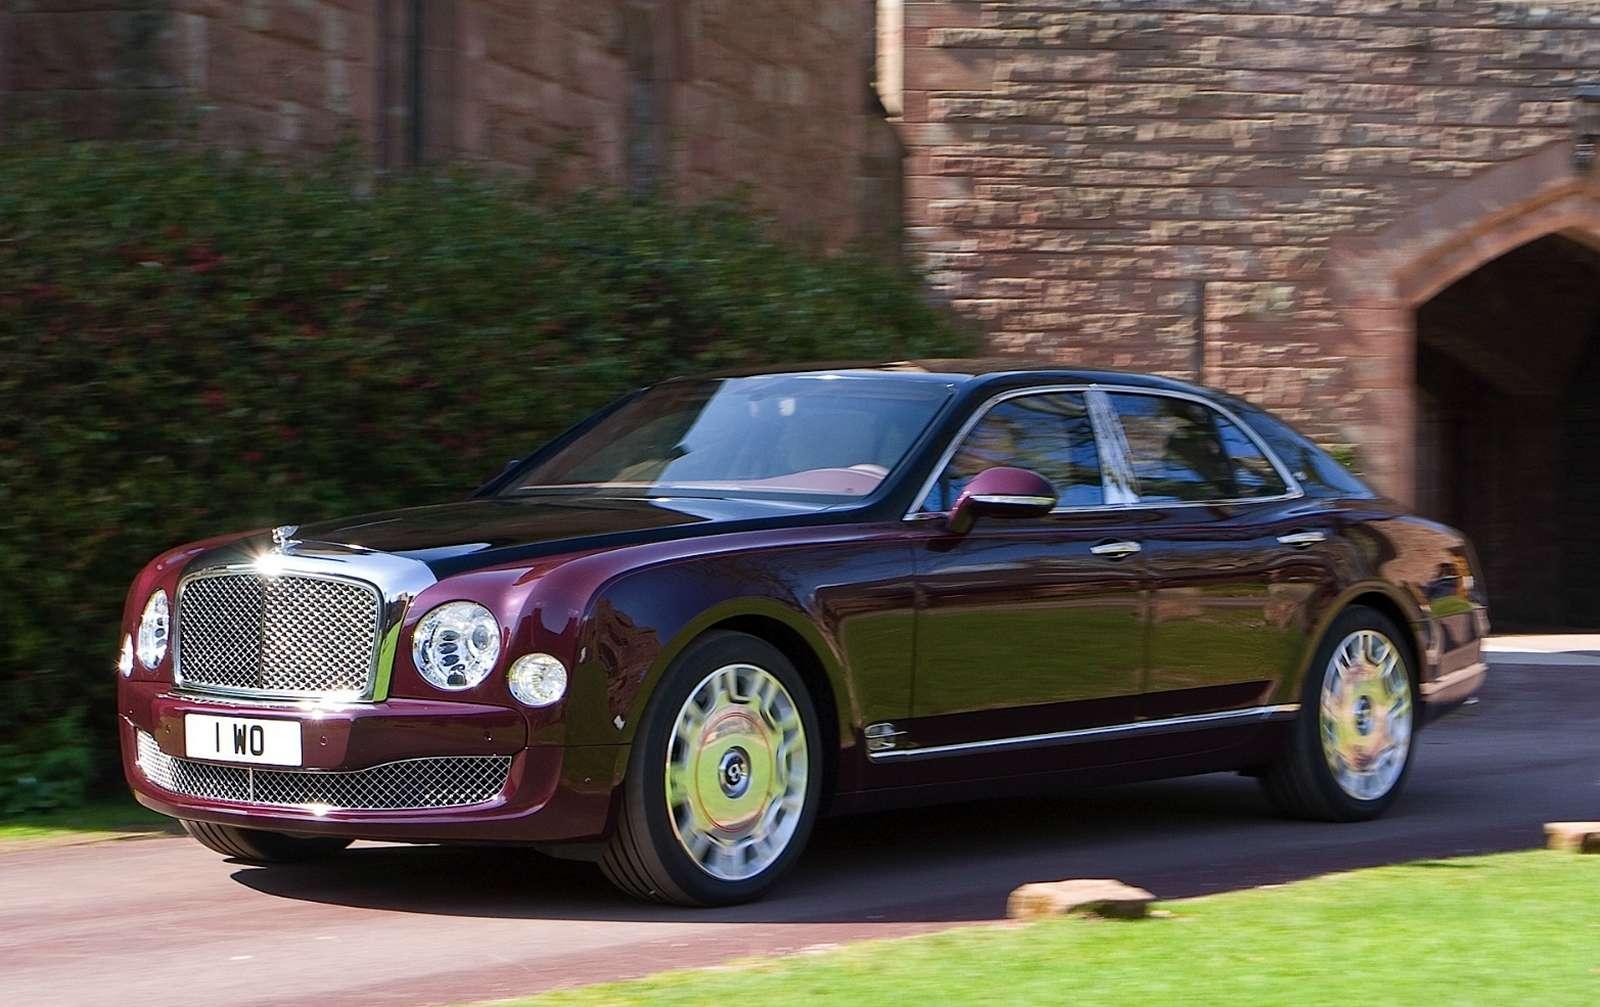 Bentley Mulsanne Diamond Jubilee Edition Used Cars